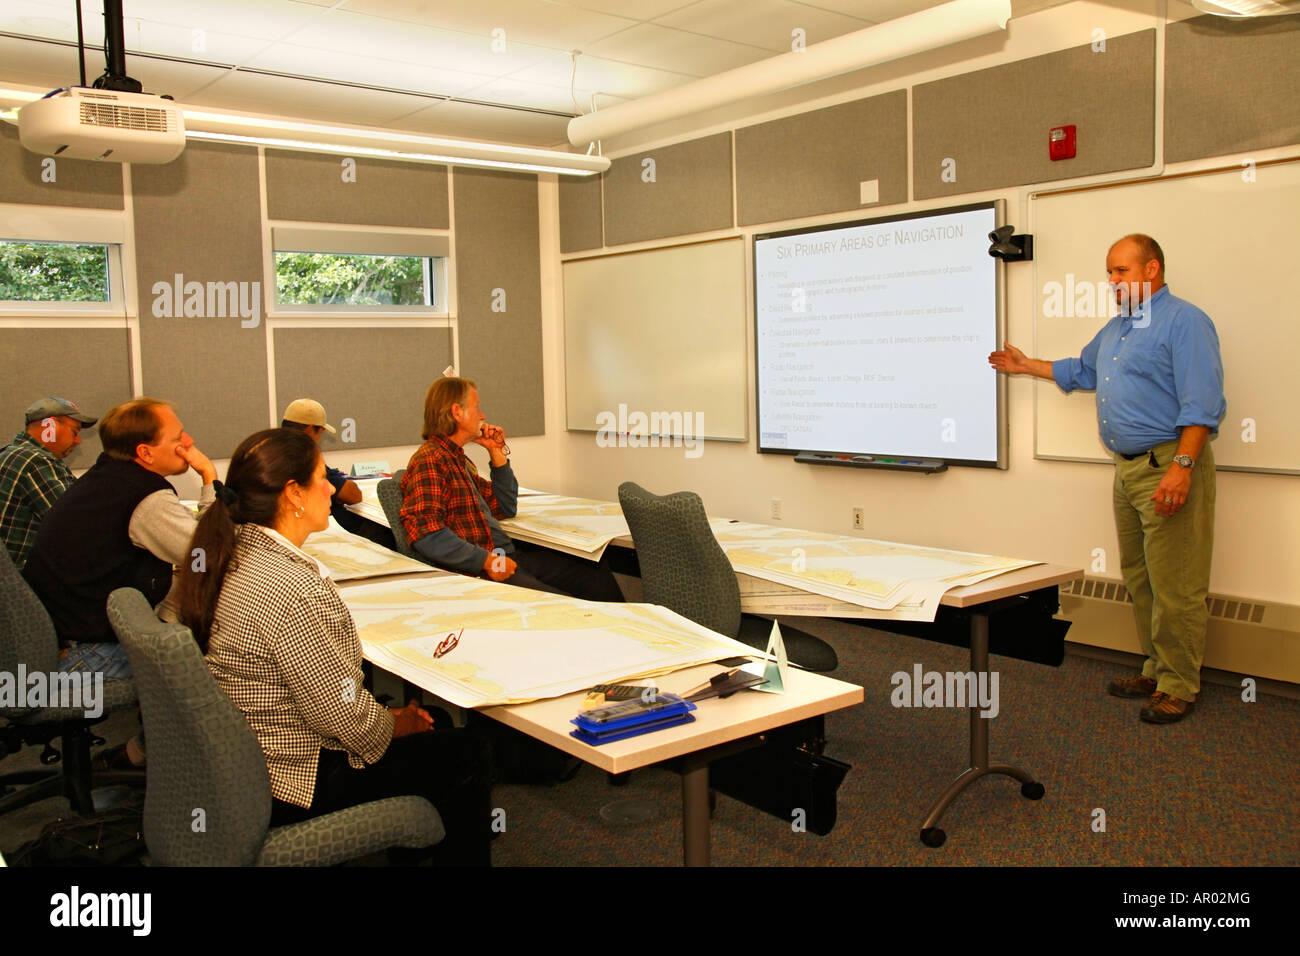 Mike teaching a navigation class AVTEC Seward, Alaska - Stock Image